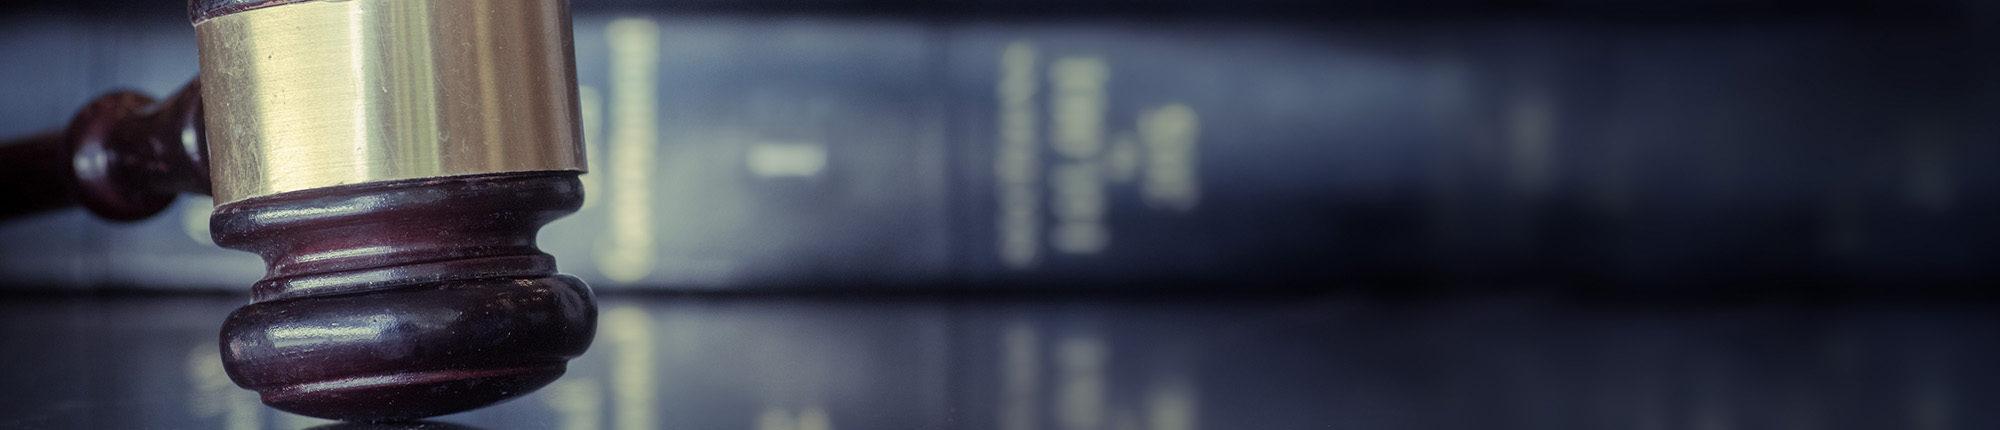 legal books in a row